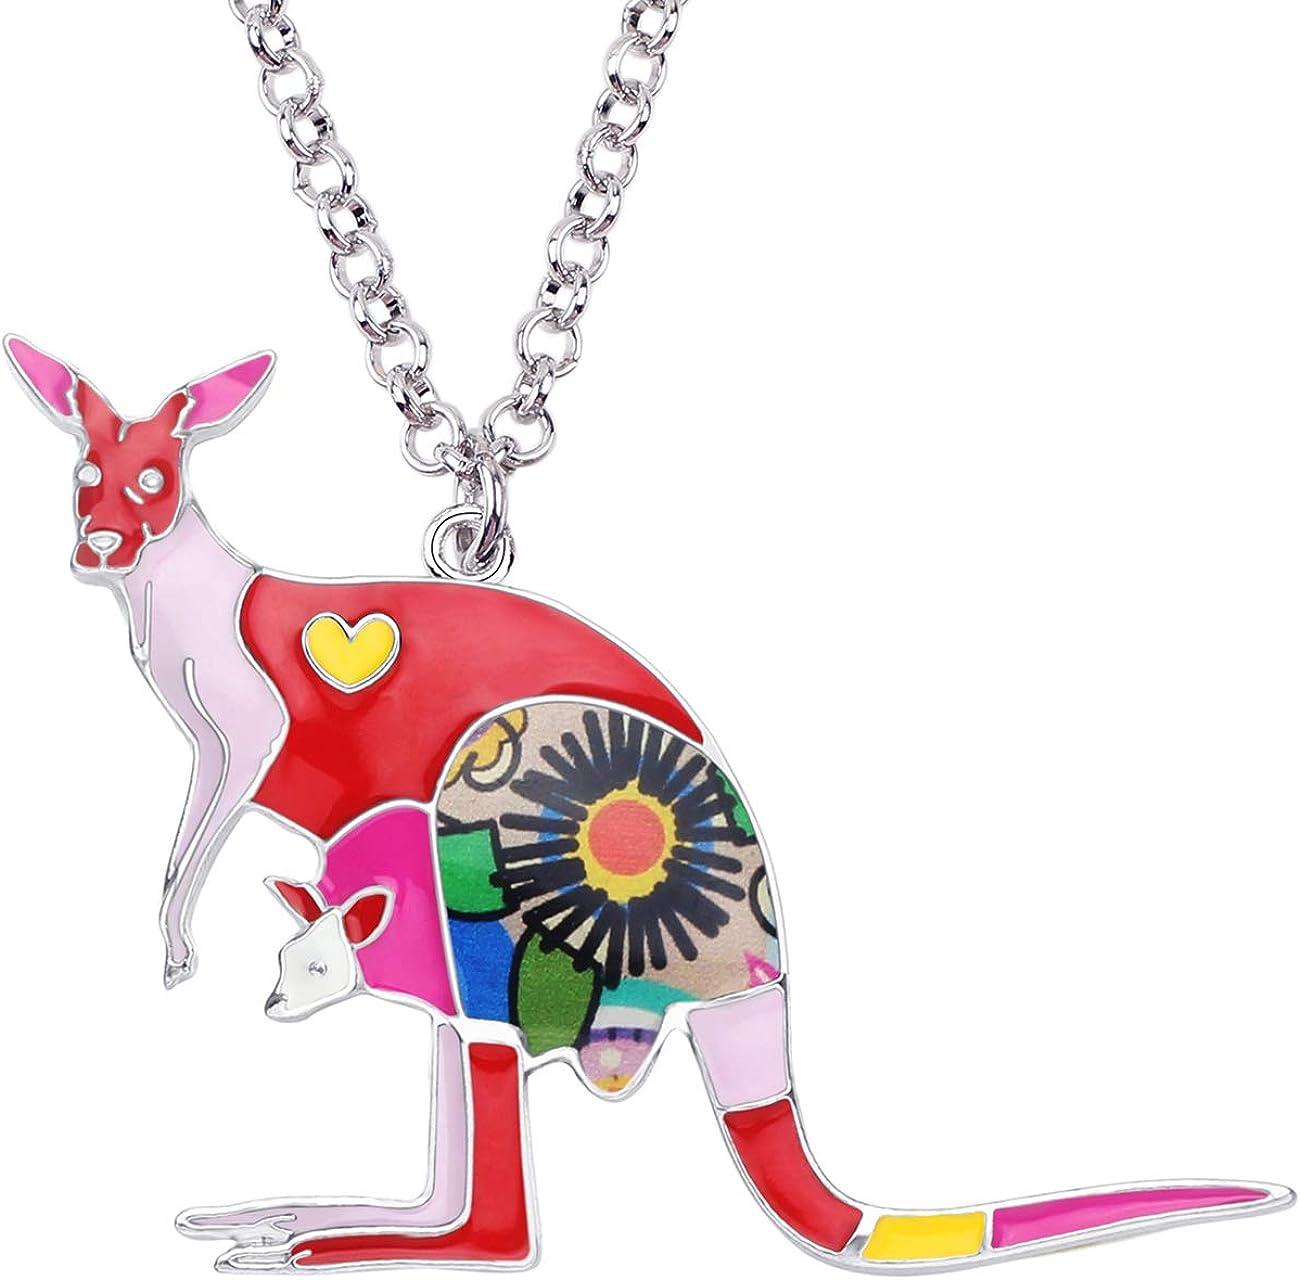 Bonsny Enamel Zinc Alloy Australia Kangaroo Choker Necklace Chain Pendant Fashion Animal Jewelry for Women Girl Charm Gift